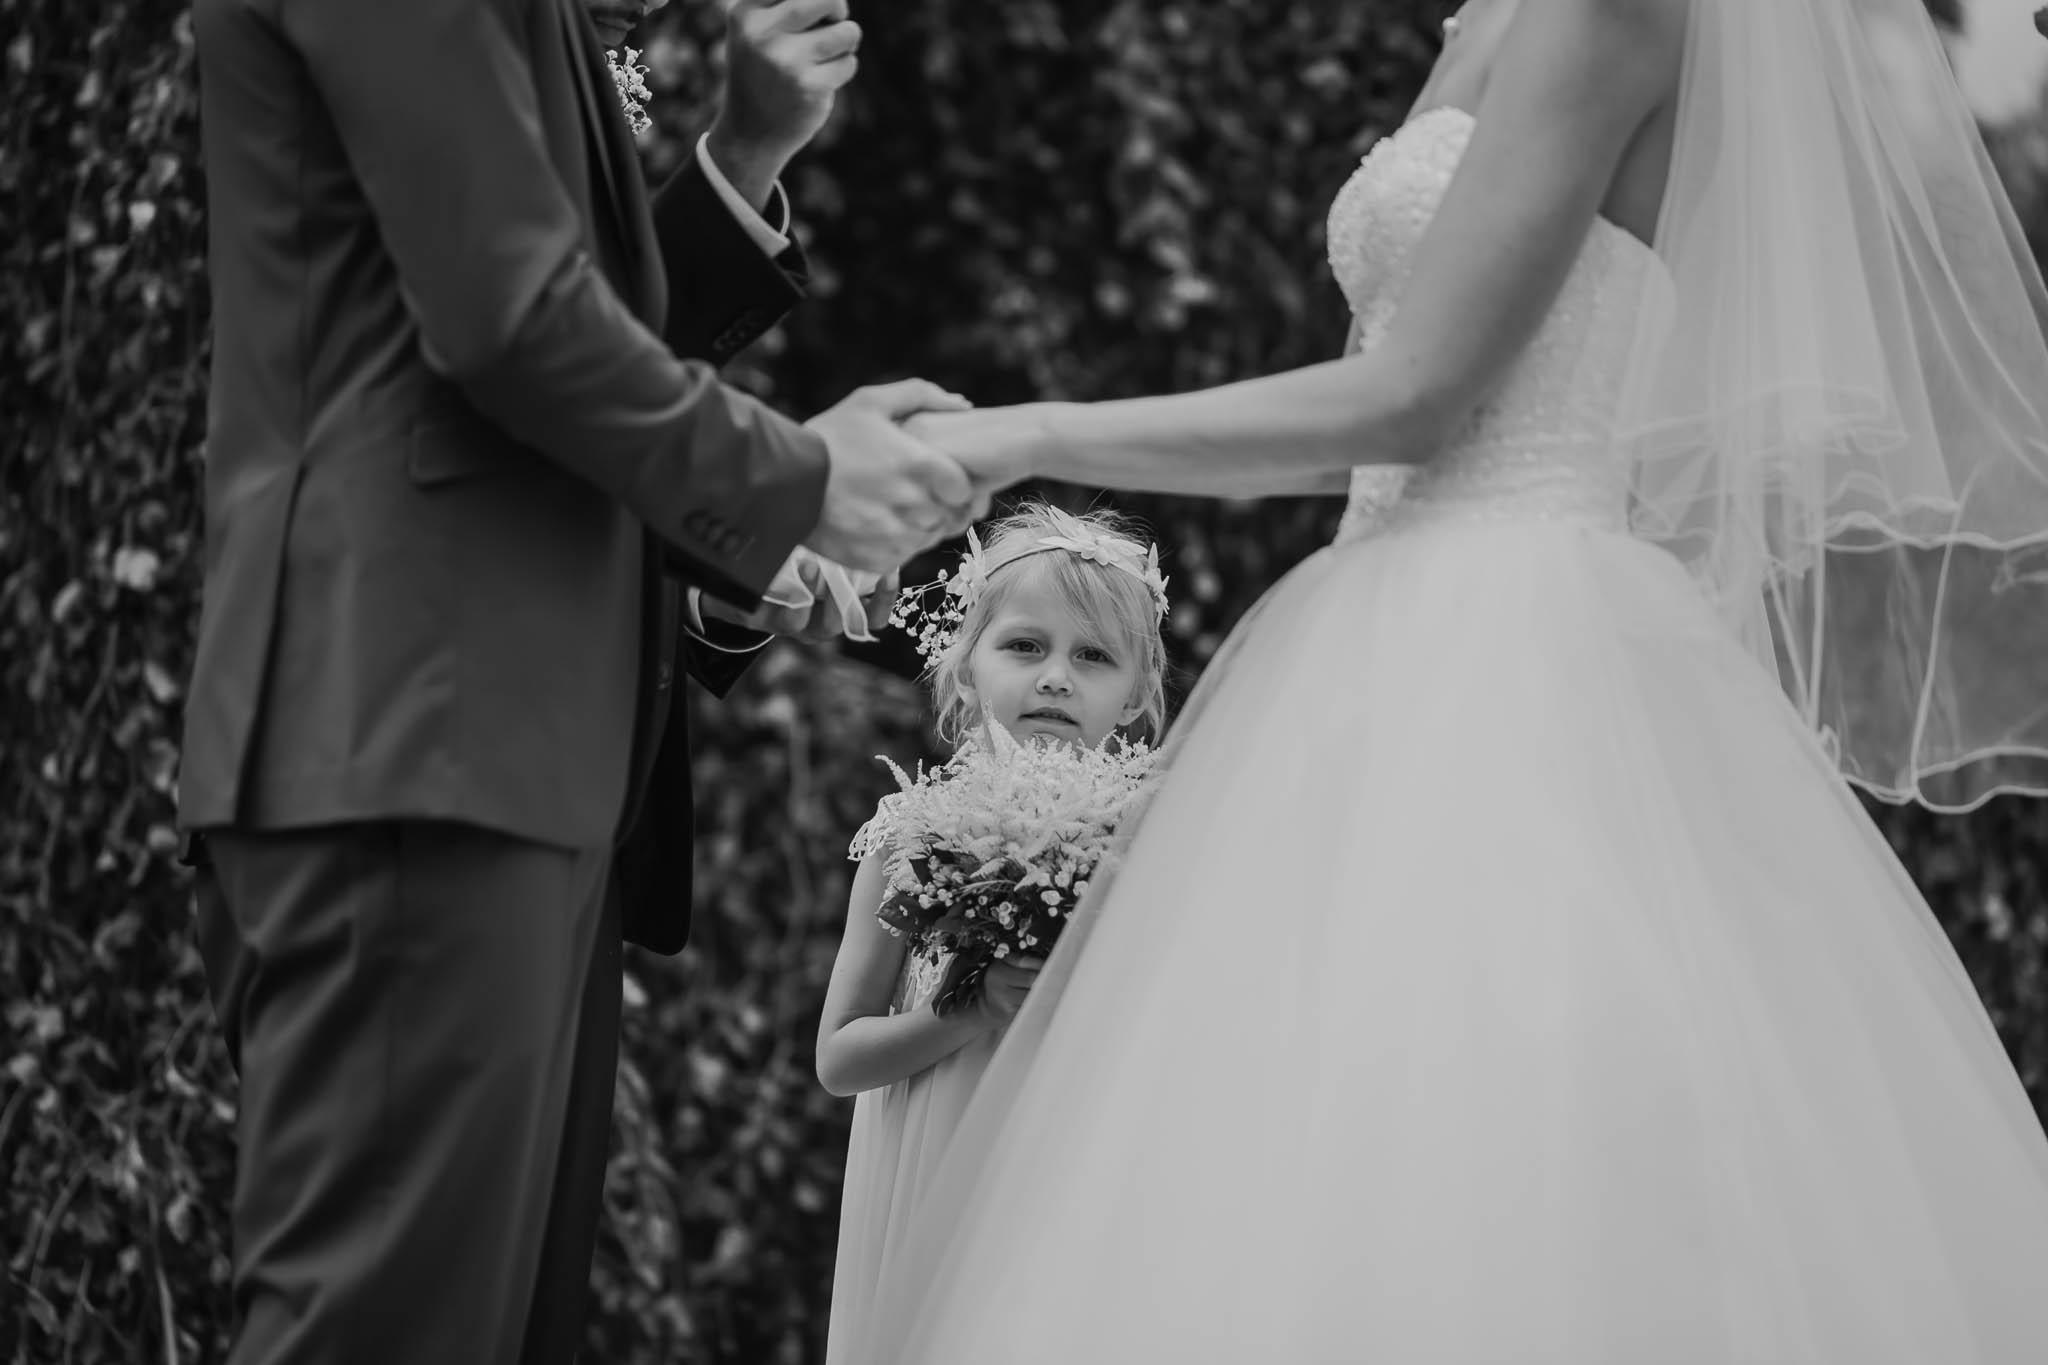 mariage-chateau-gaudras-ingold-49.jpg